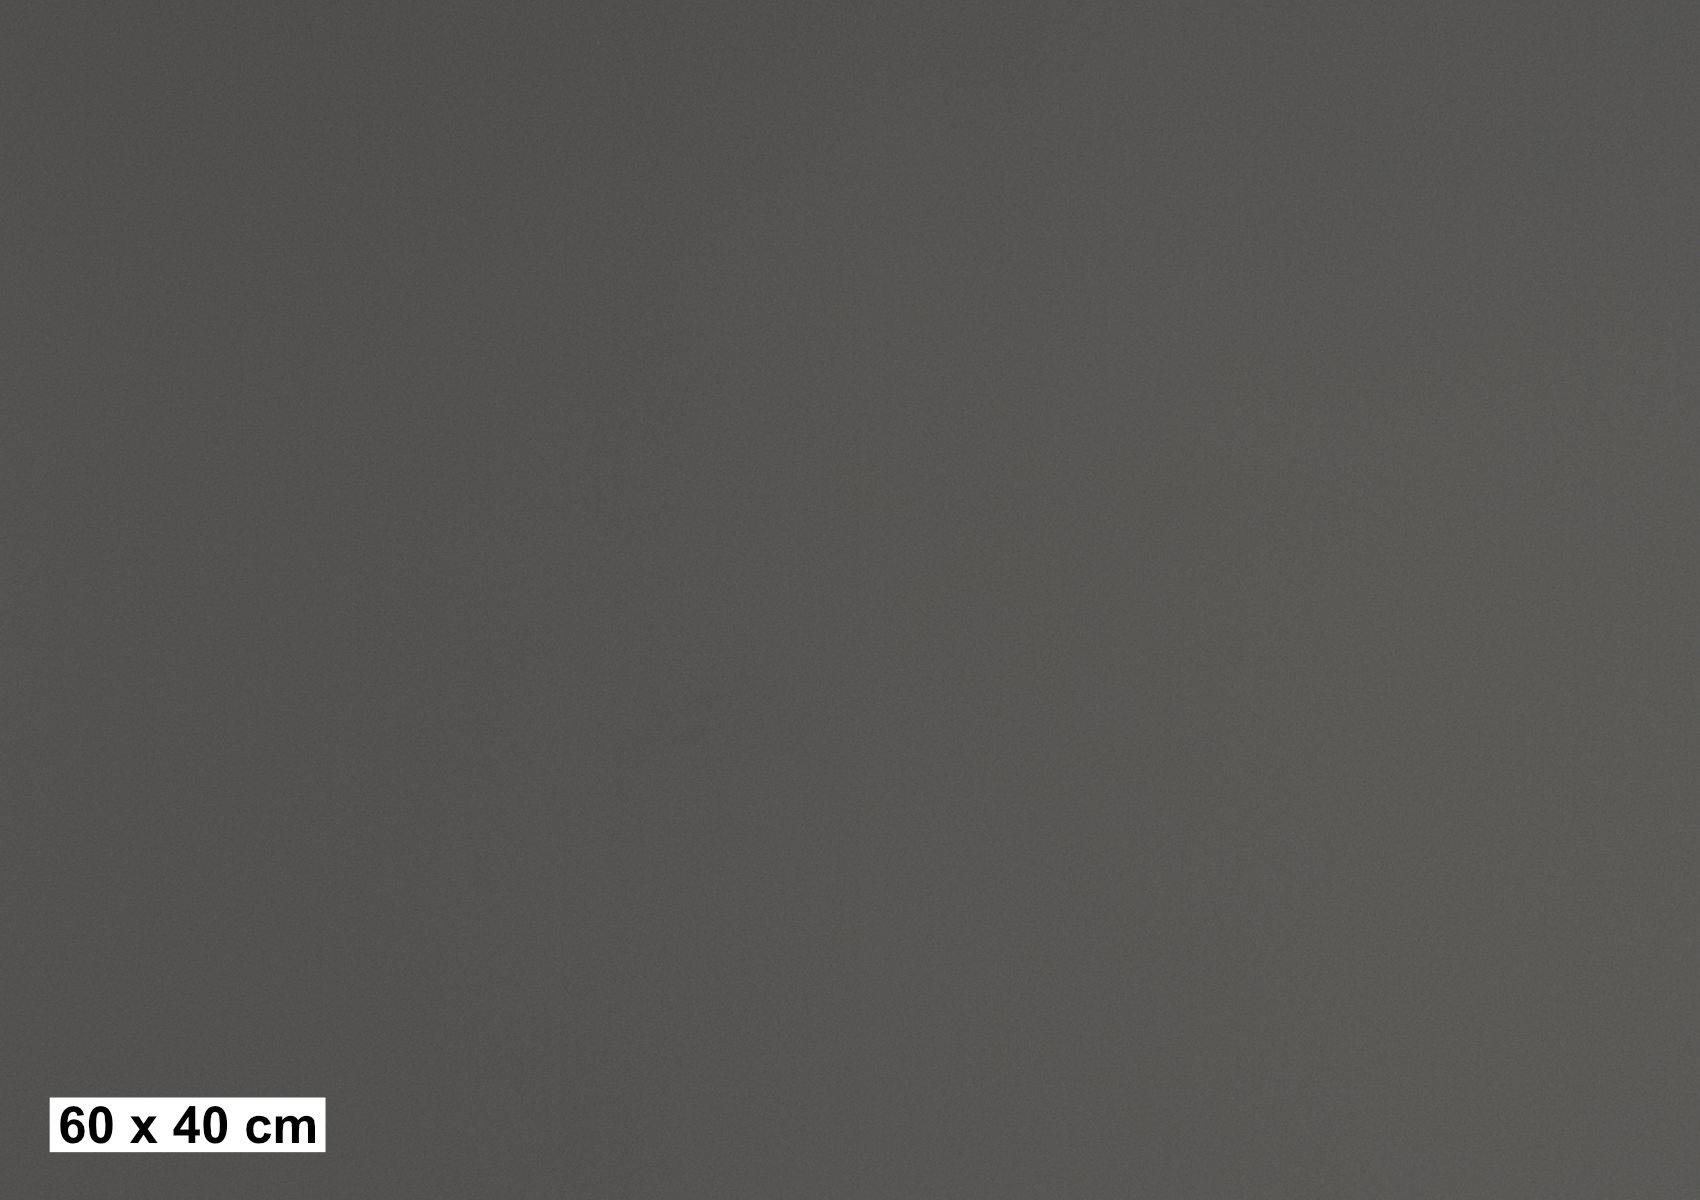 Feinstein dunkel grau S412